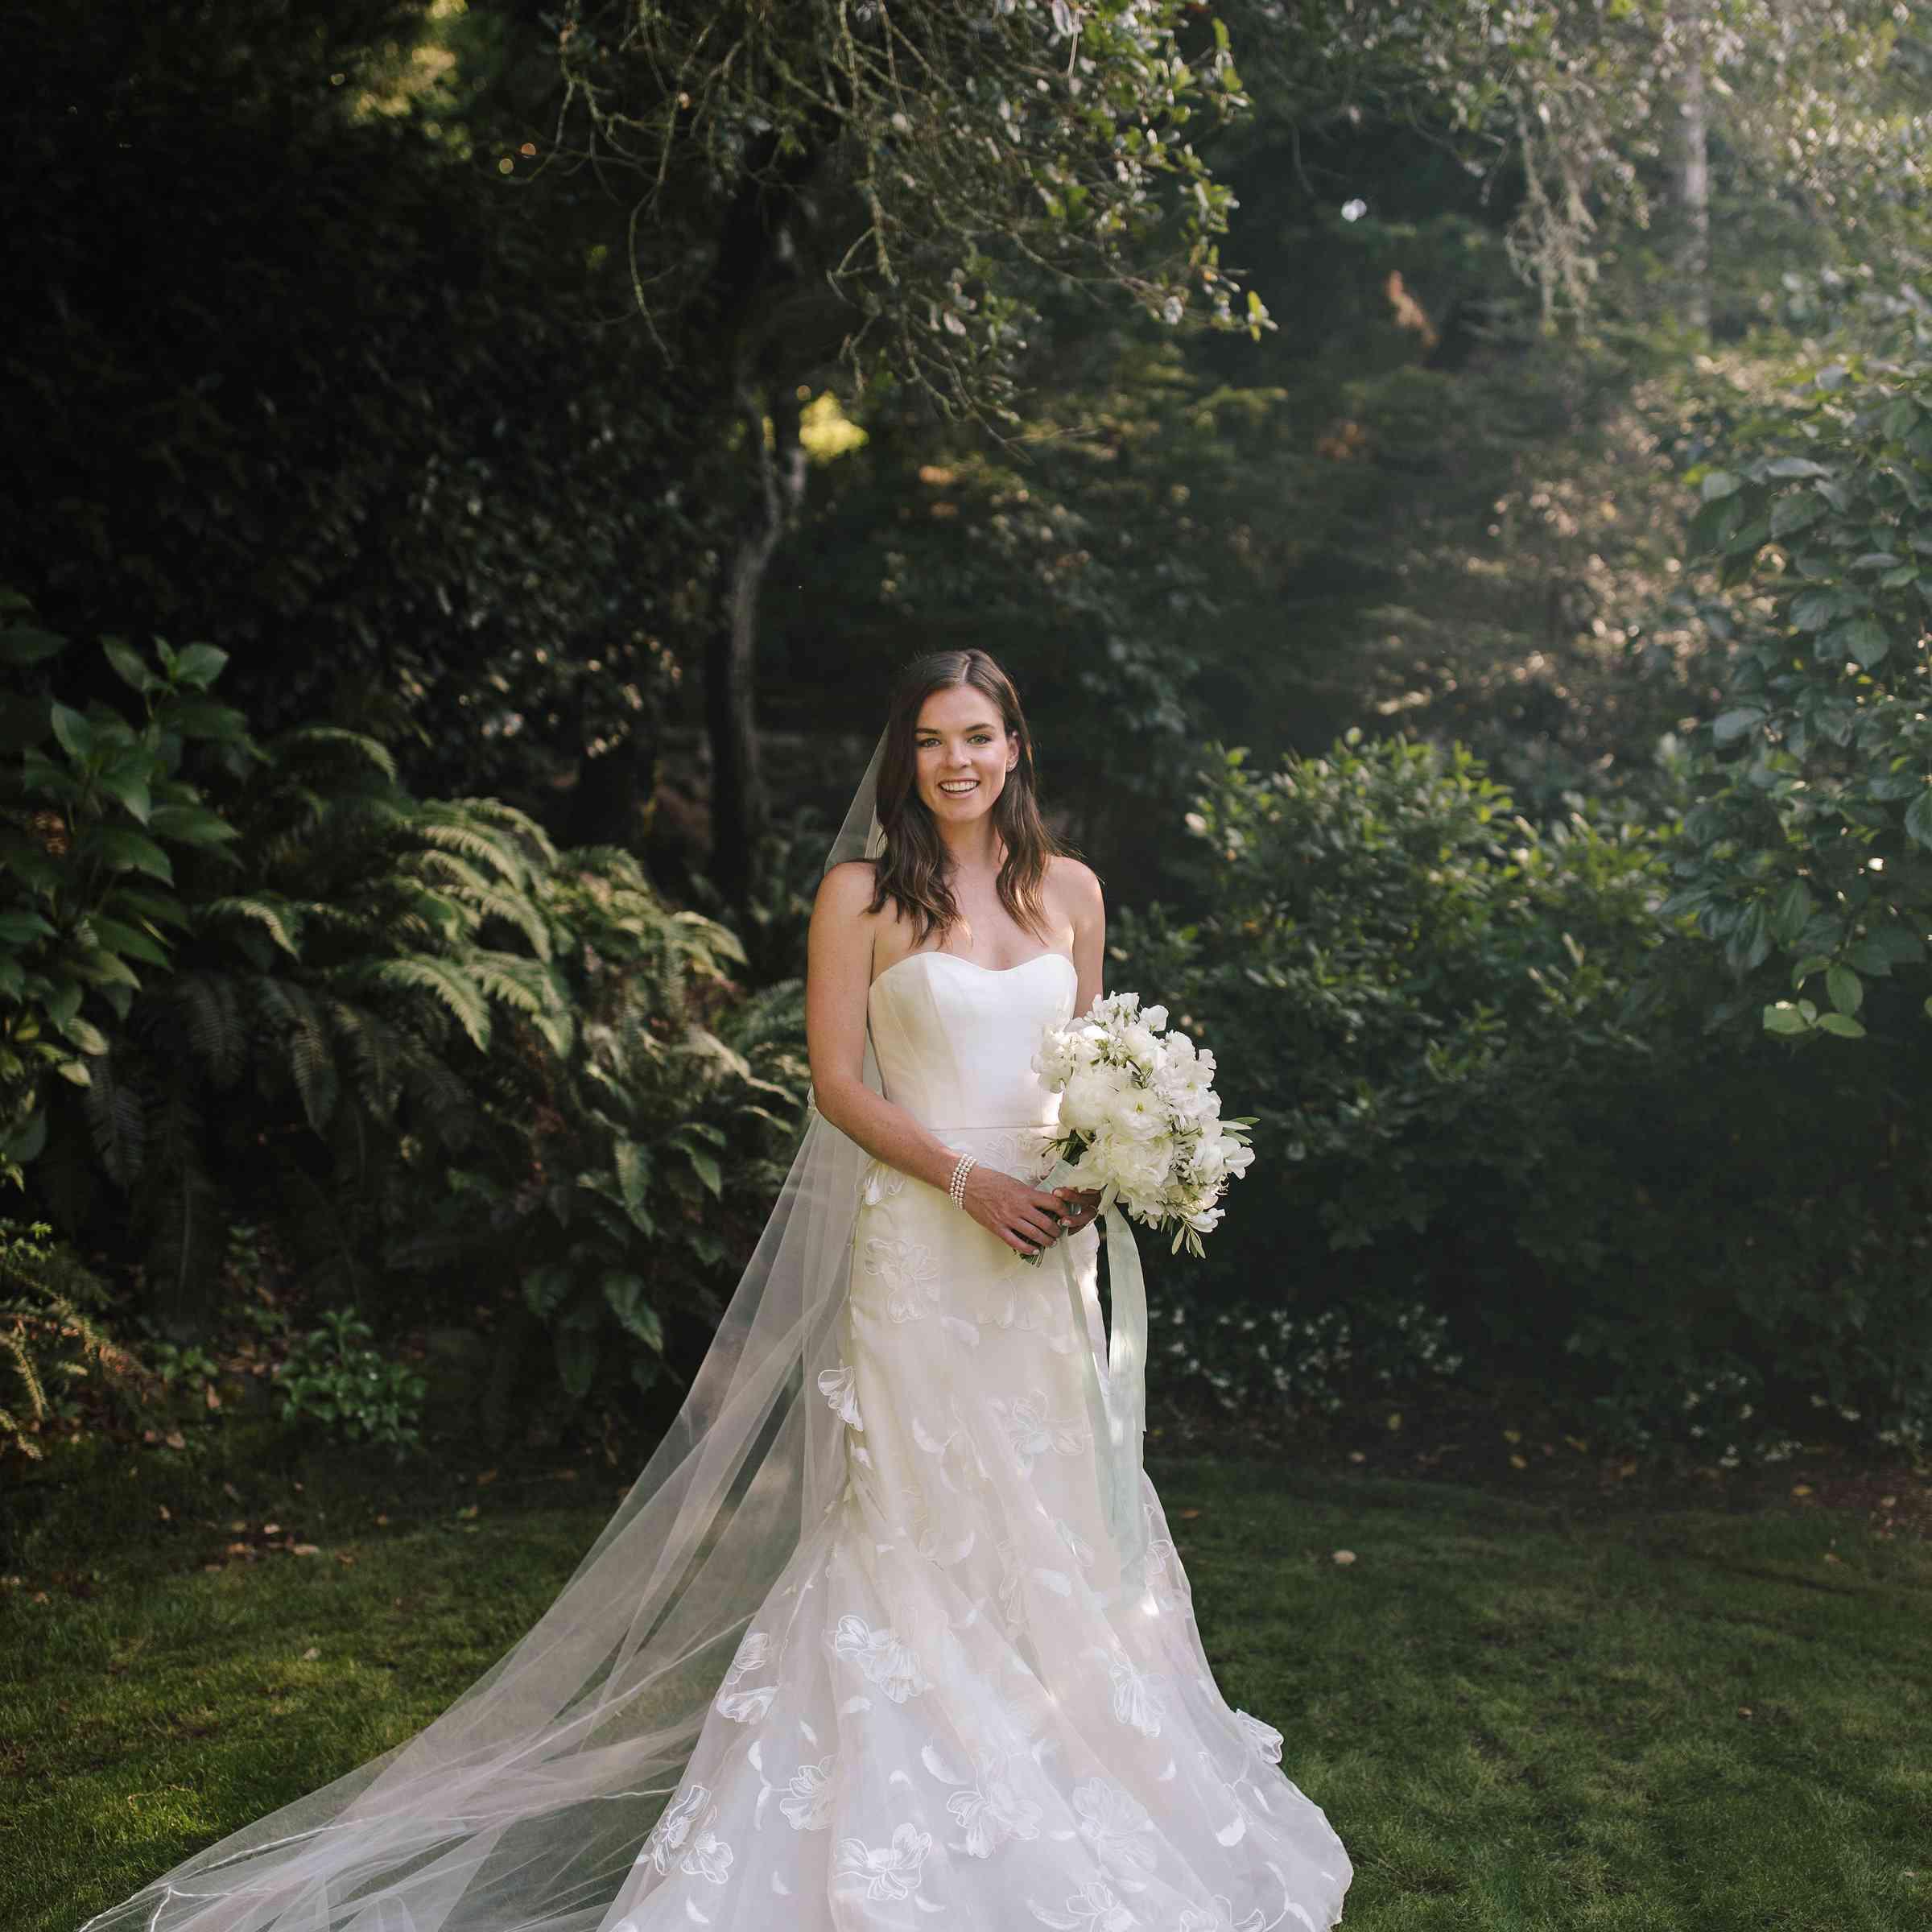 <p>bride with veil in wedding dress</p><br><br>